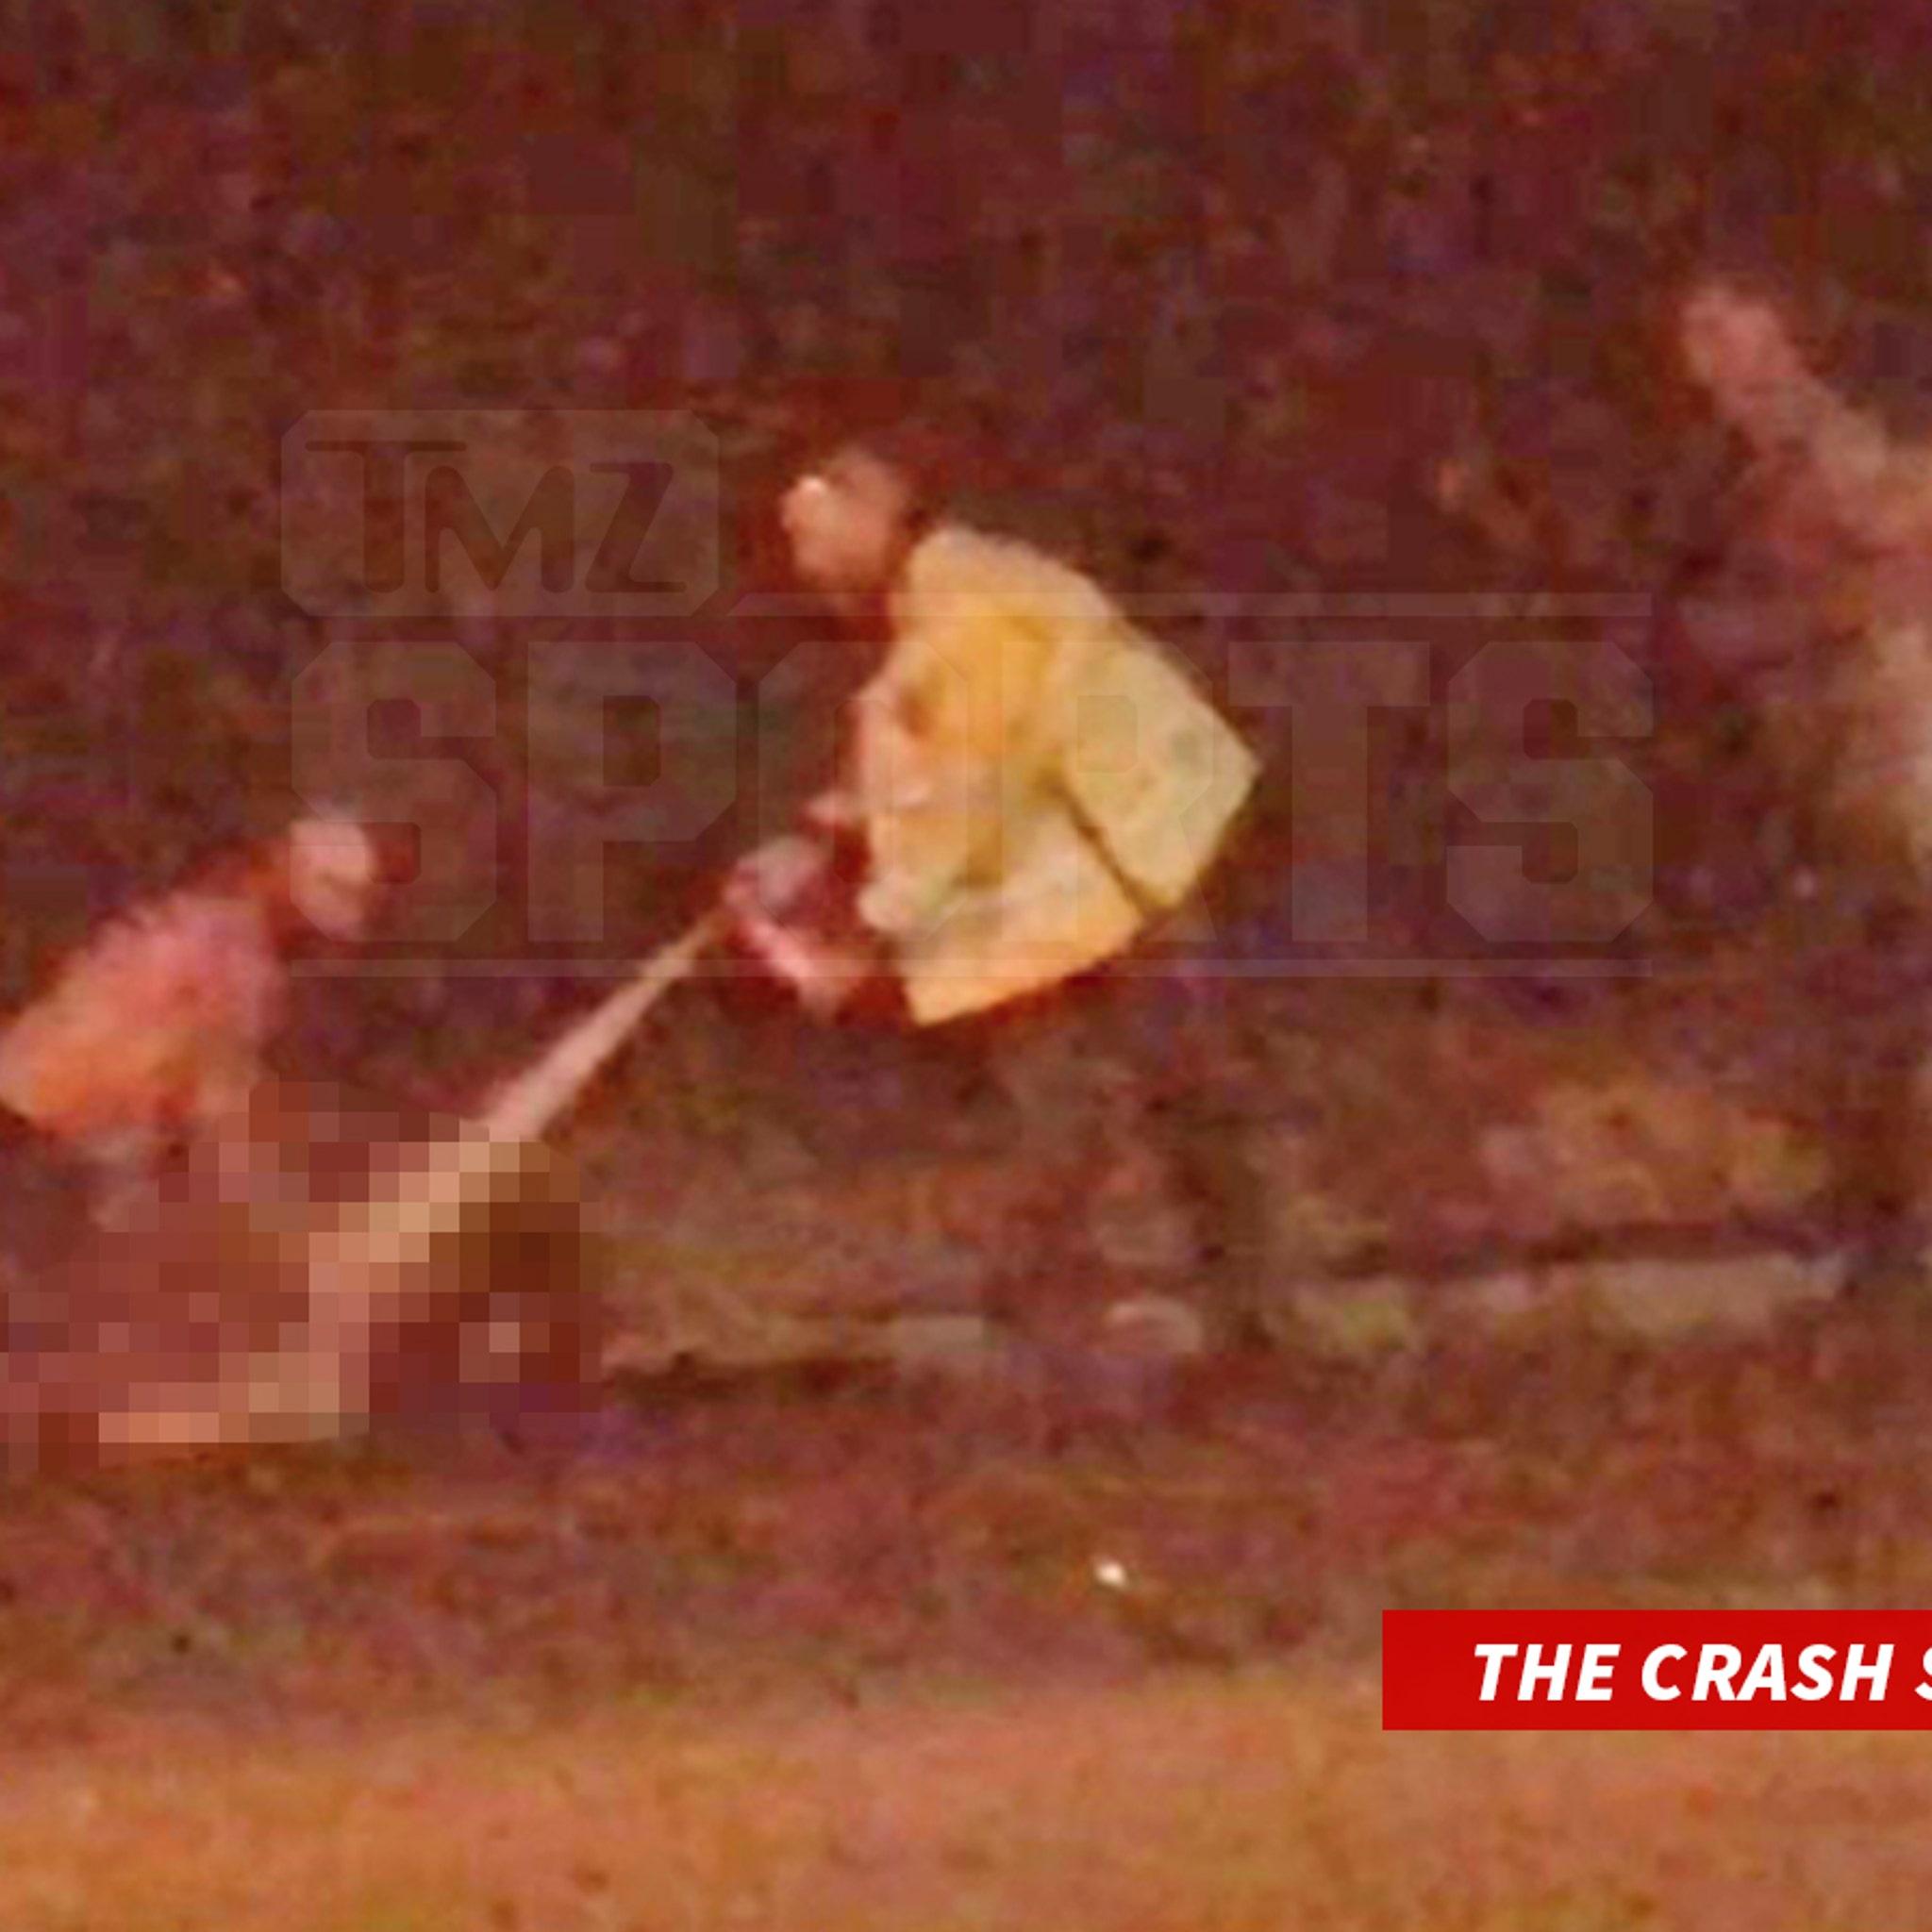 Cedric Benson Crash Video Shows Bystanders Rushing to Help NFL Star